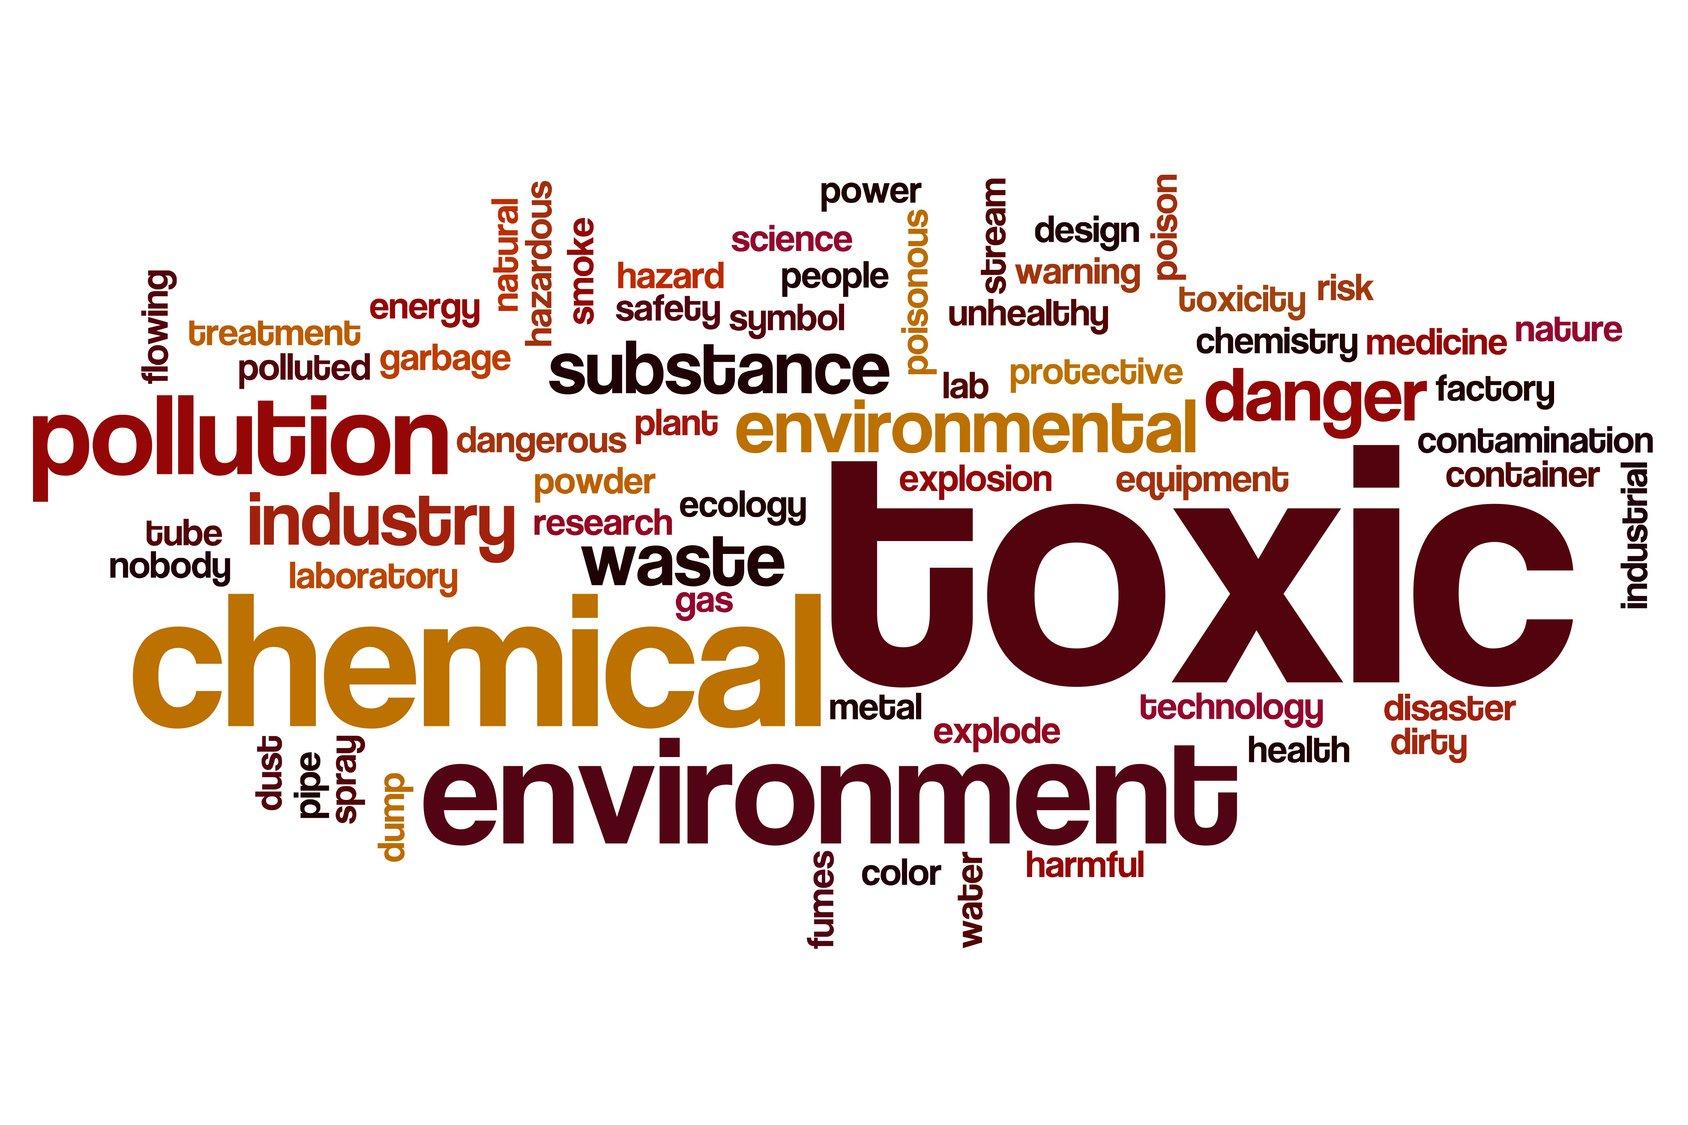 Les herbicides Roundup perturbent les hormones sexuelles